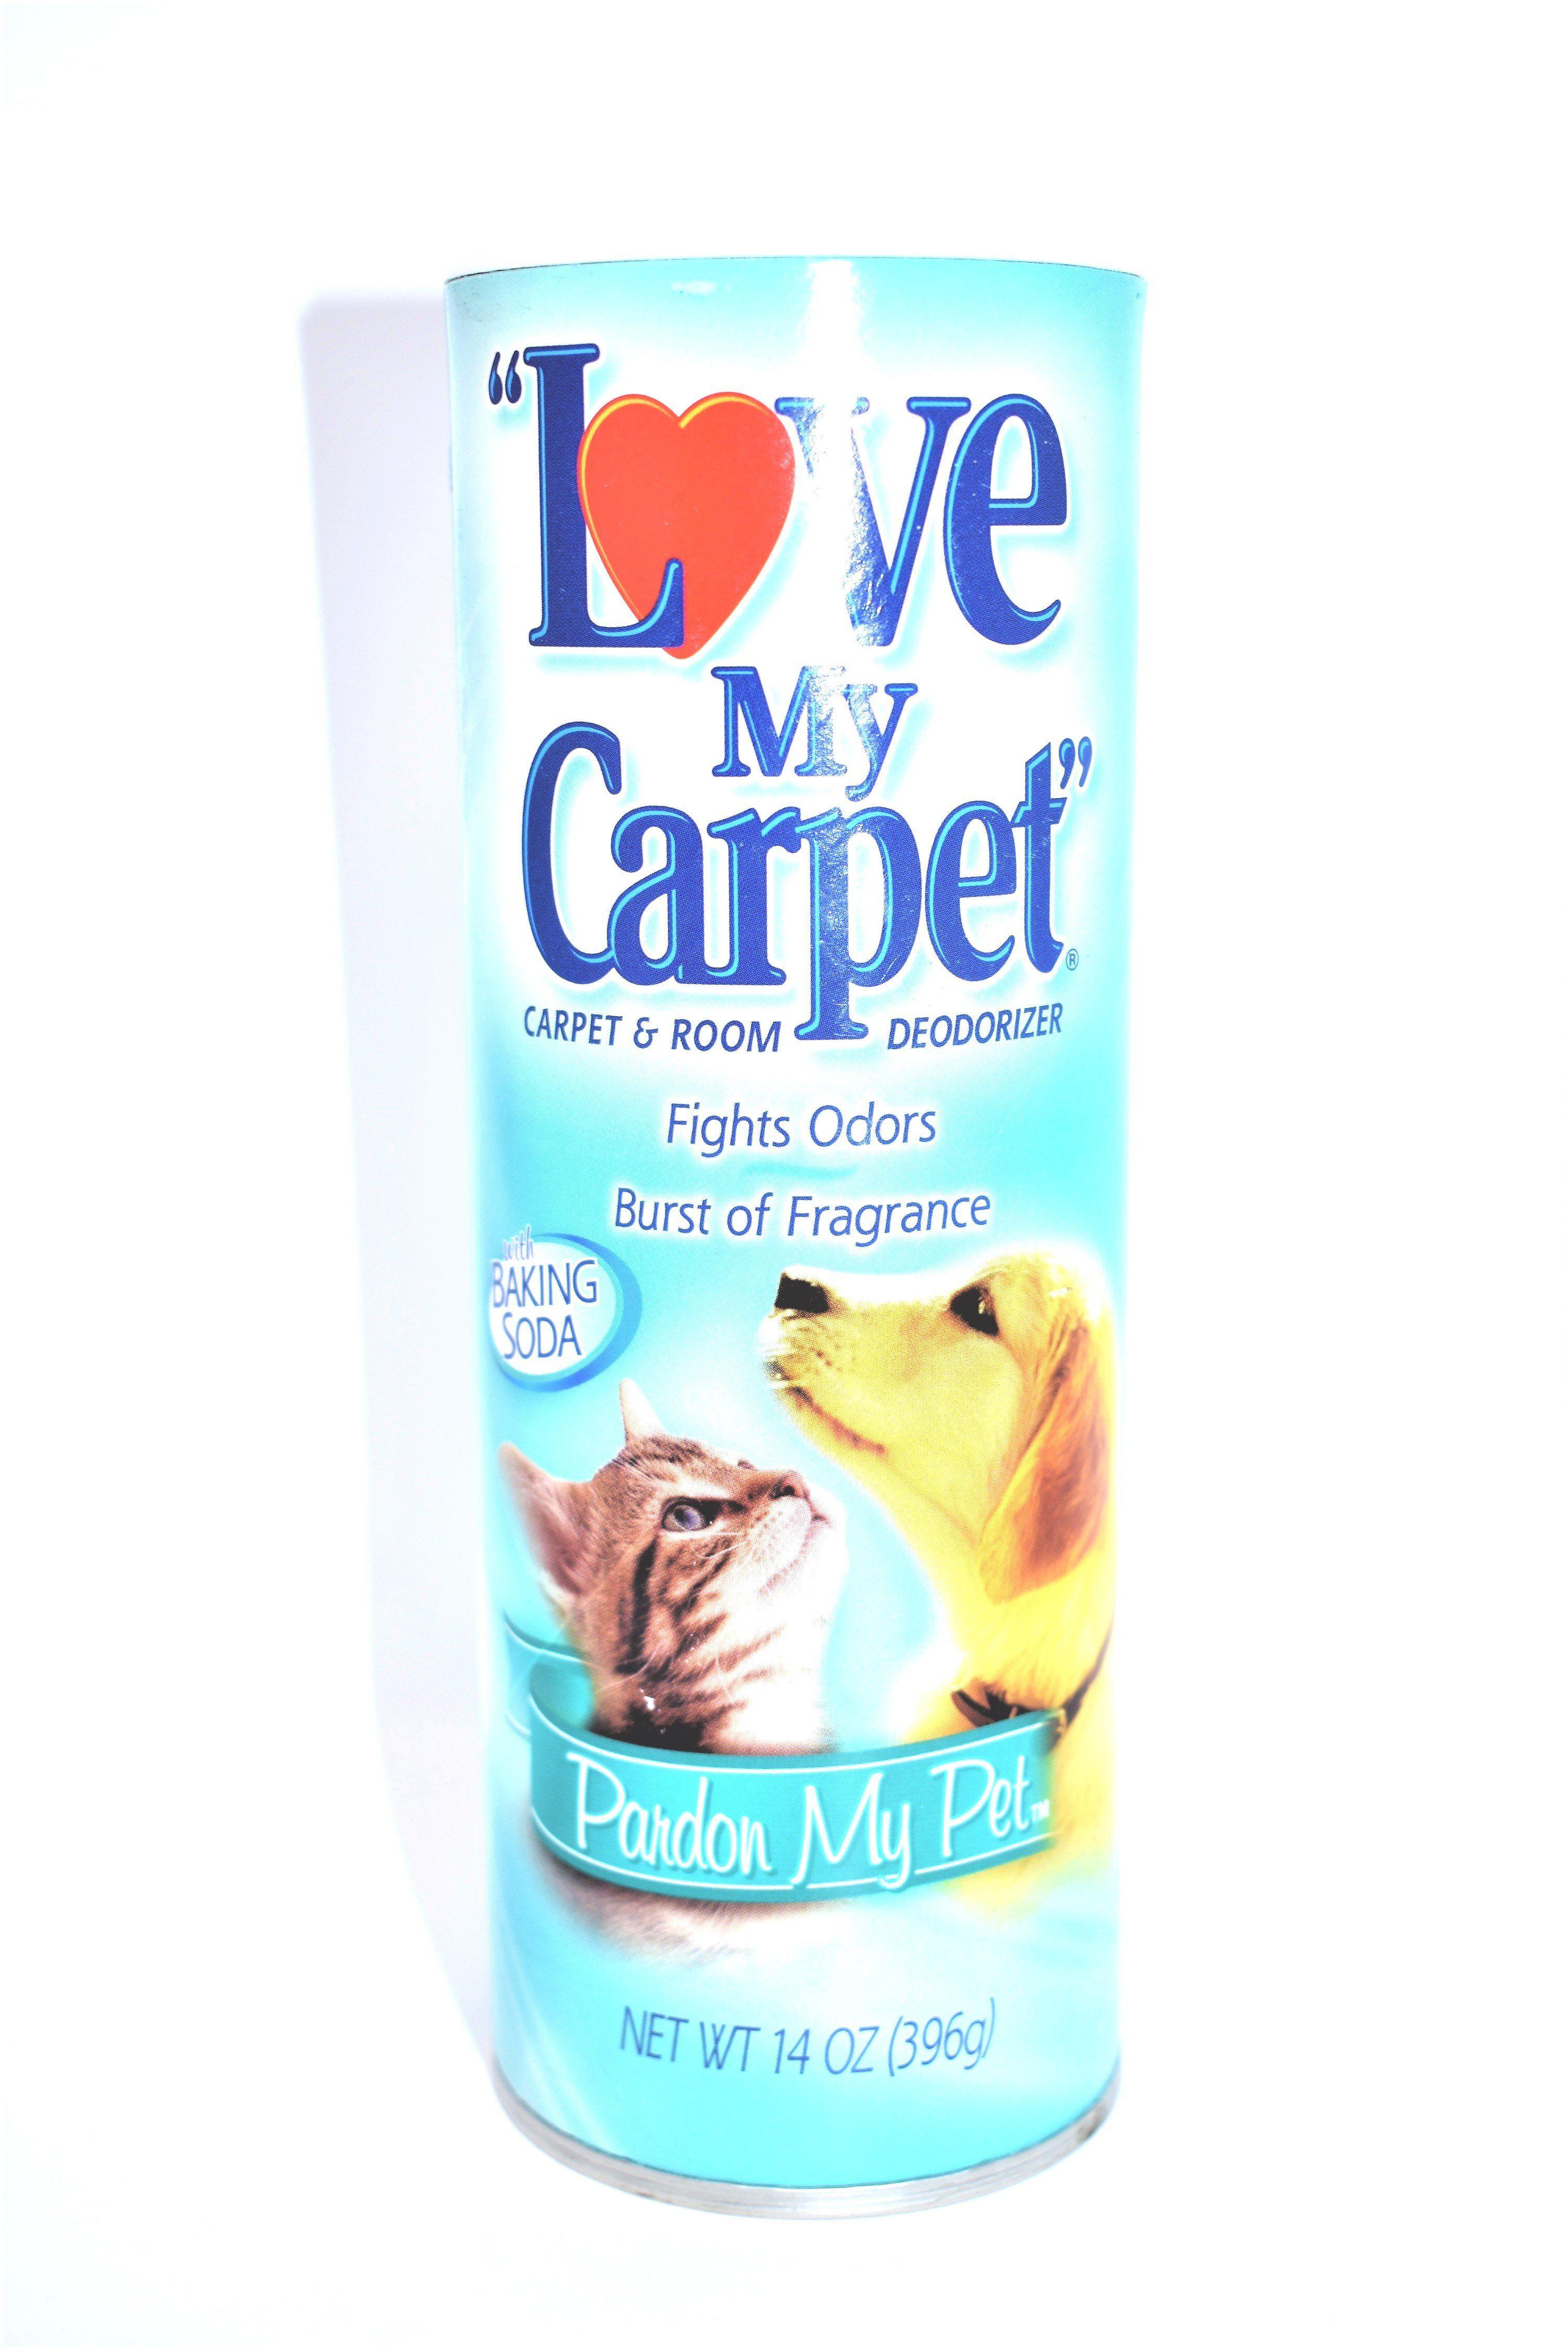 Love My Carpet Pardon My Pet Carpet Room Deodorizer 14 Oz Room Deodorizer Deodorant Lavender Scent